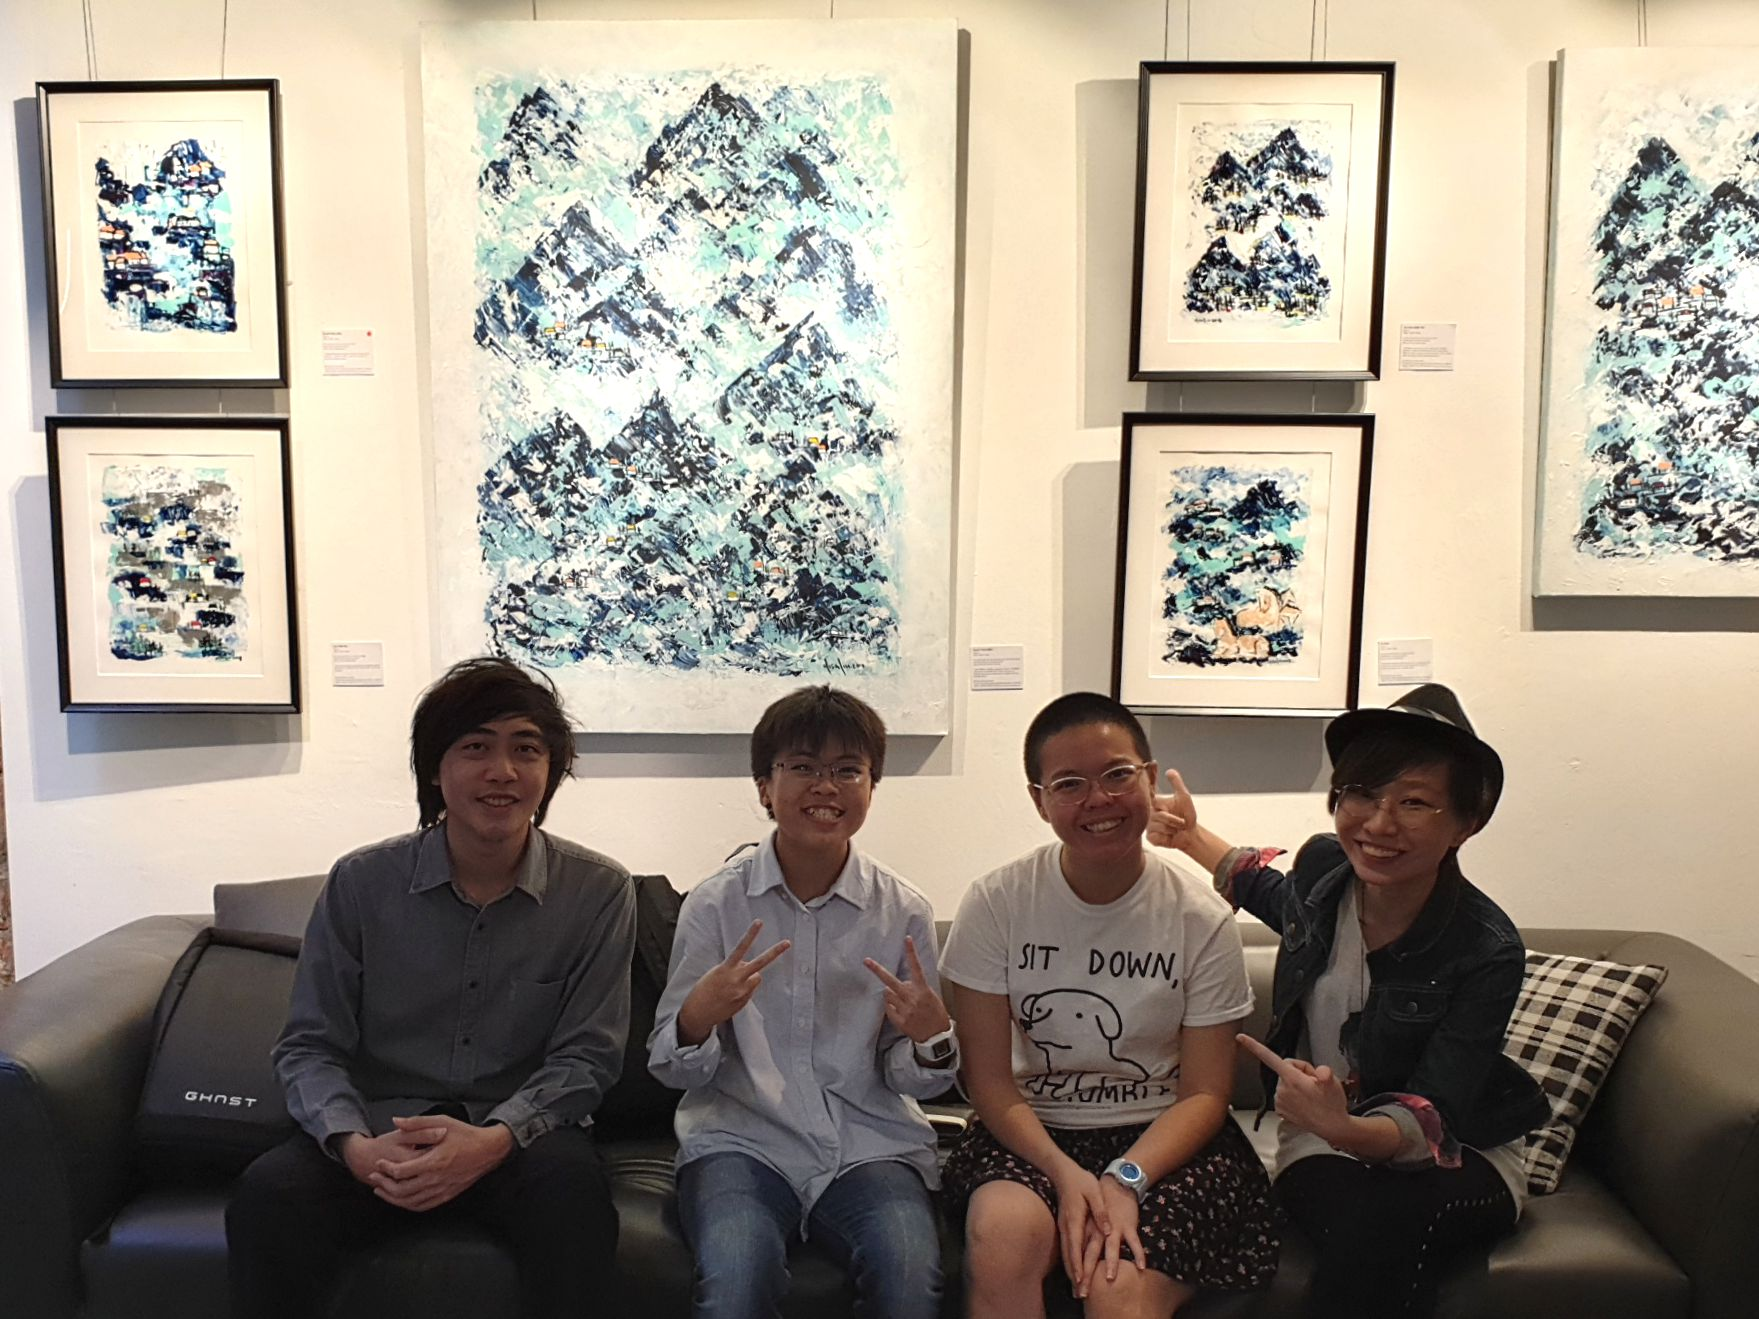 Elisa-Liu-Art-Landscapes-of-our-Minds-Exhibition-Artist Tour-06.jpg